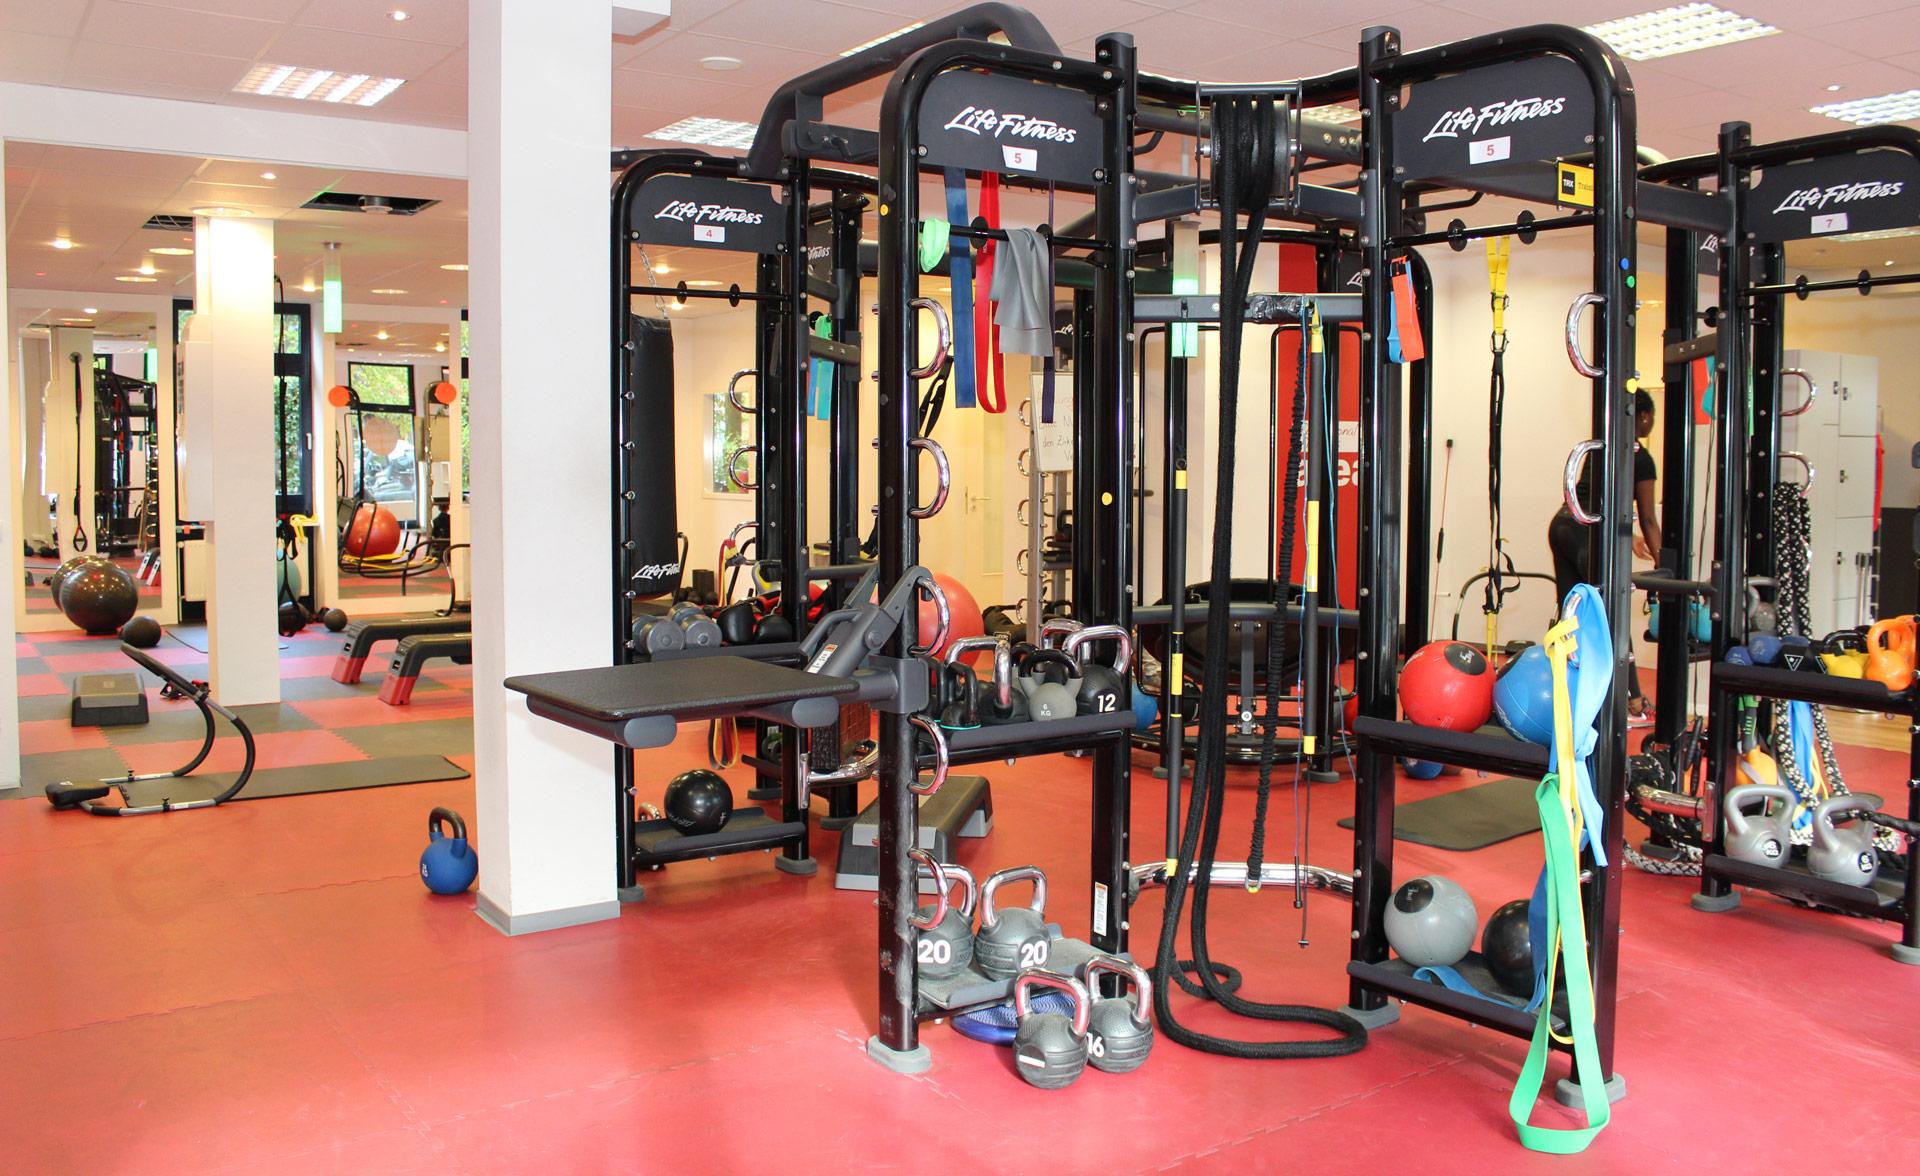 fitxpress ems training functional fitness in hamburg rahlstedt farmsen berne. Black Bedroom Furniture Sets. Home Design Ideas